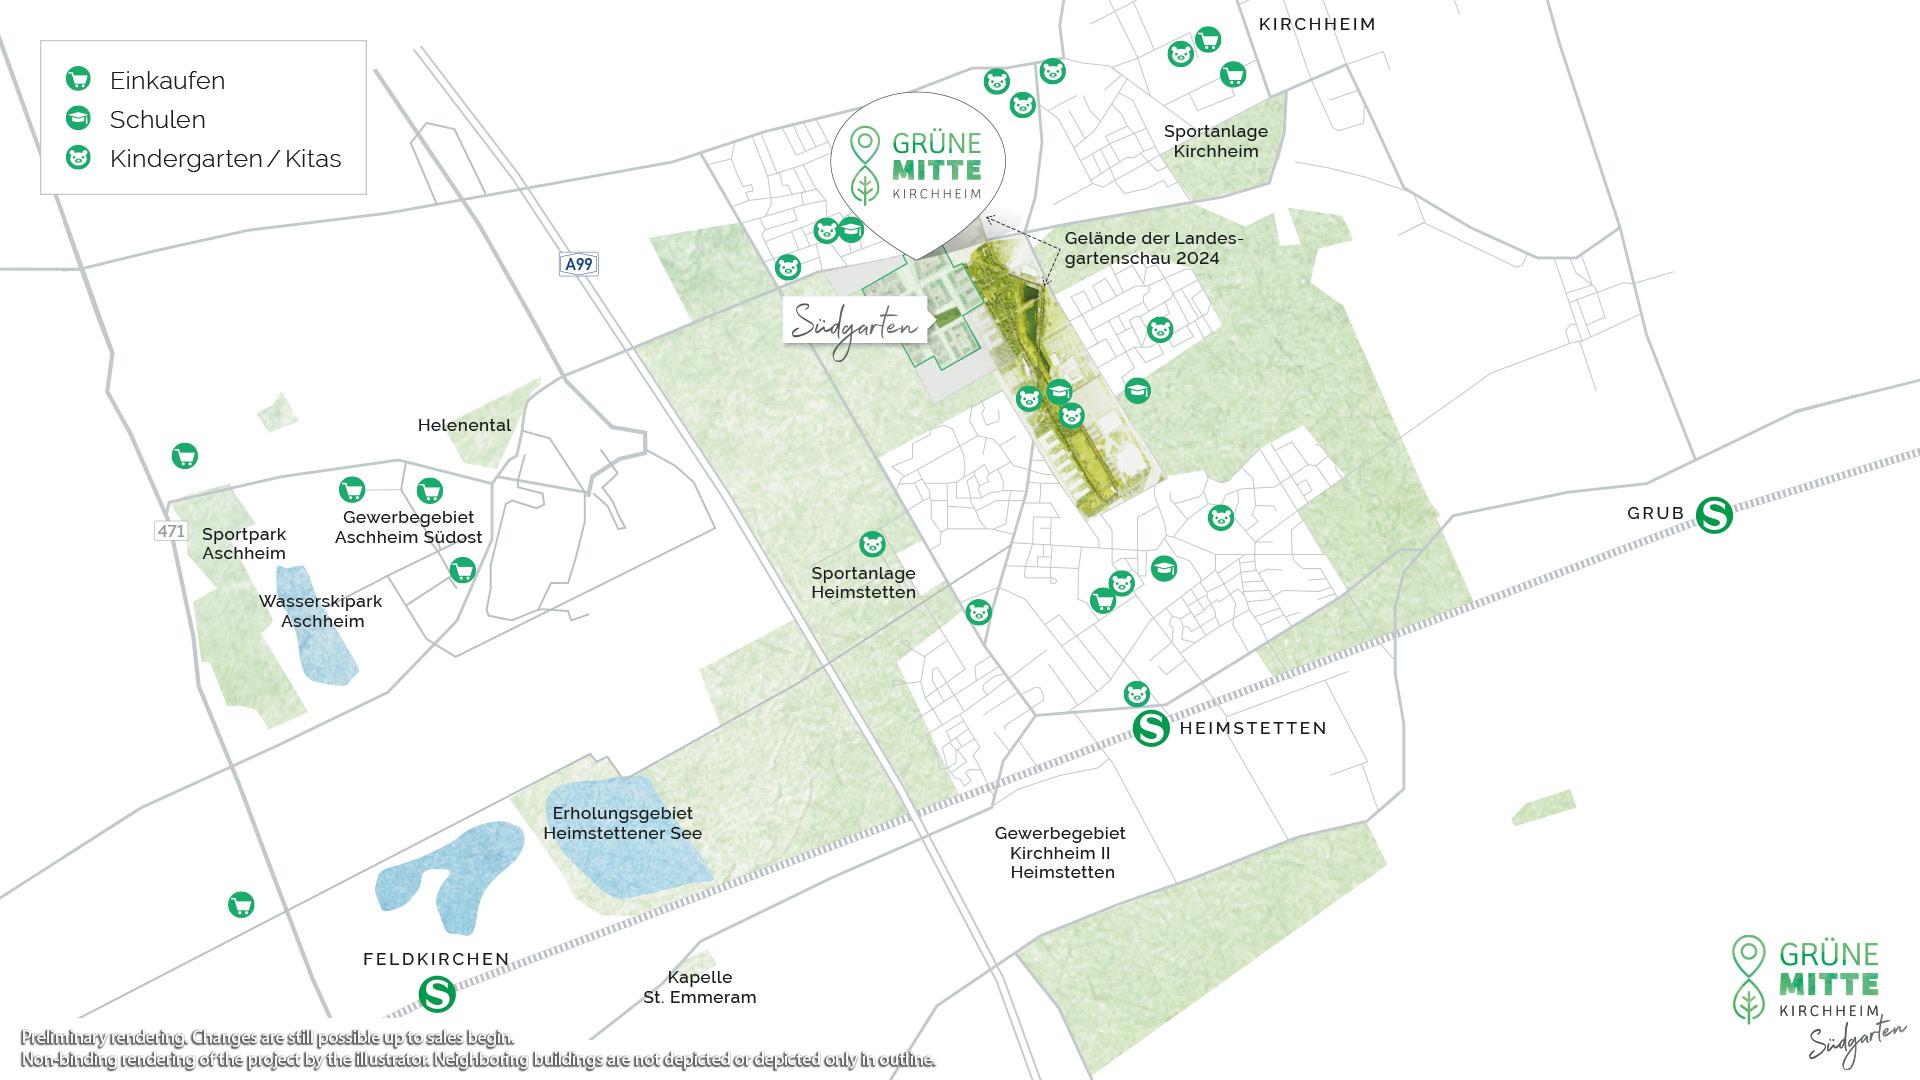 Property Gruene Mitte Kirchheim - Suedgarten - Illustration Overview